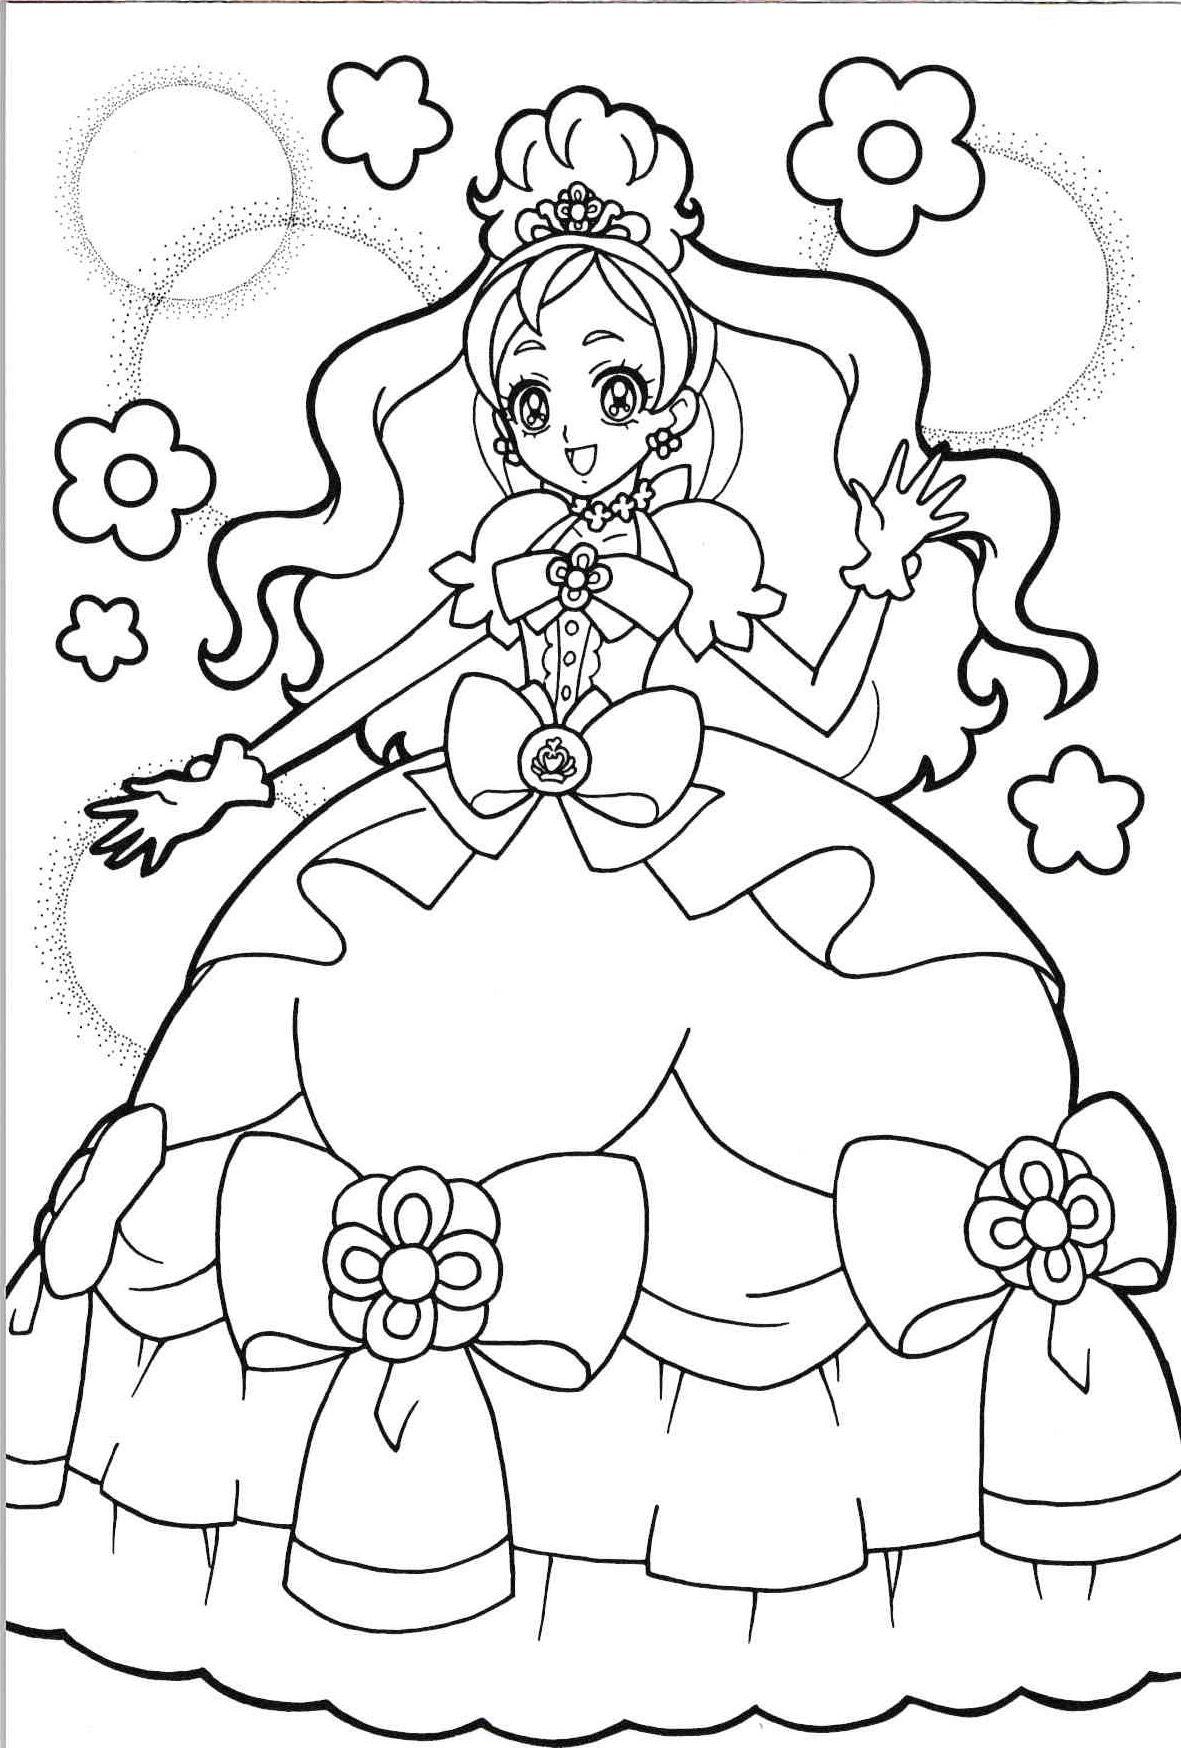 Ausmalbilder Feen Prinzessin : Princess Precure Cure Flora Precure Pinterest Ausmalbilder